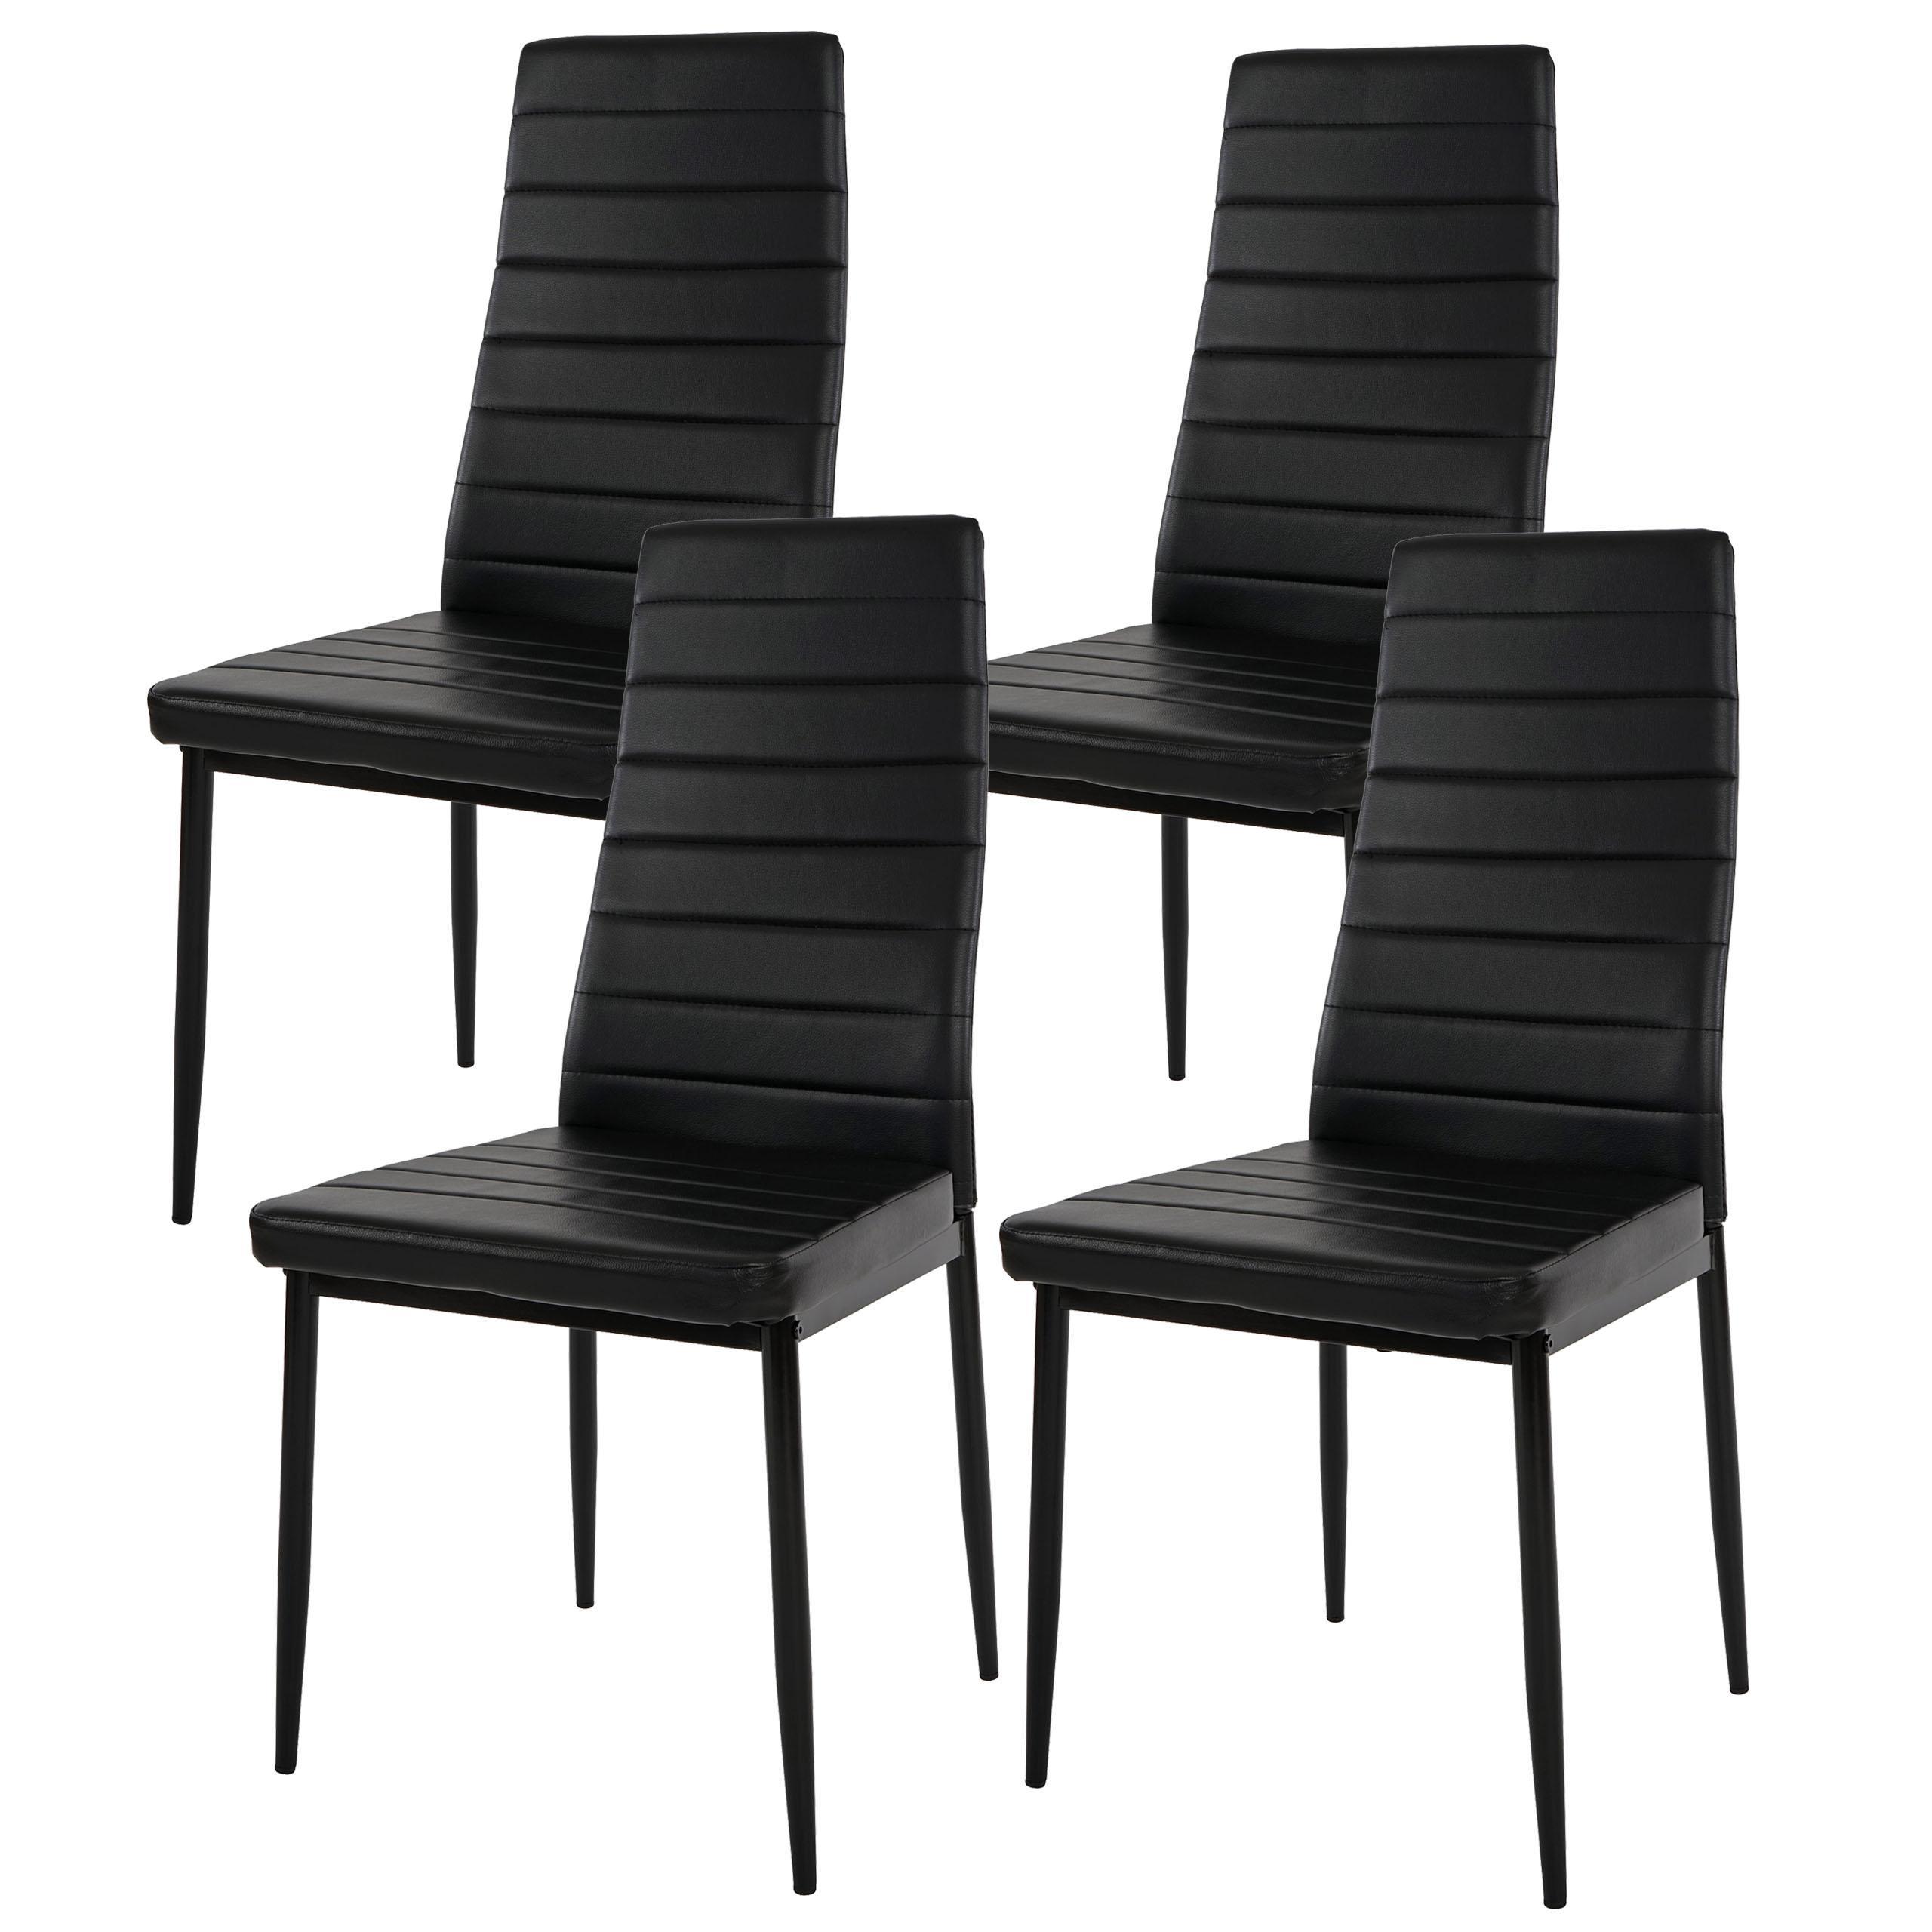 Lote 4 sillas de comedor o cocina kiros gran acolchado for Sillas de comedor de piel